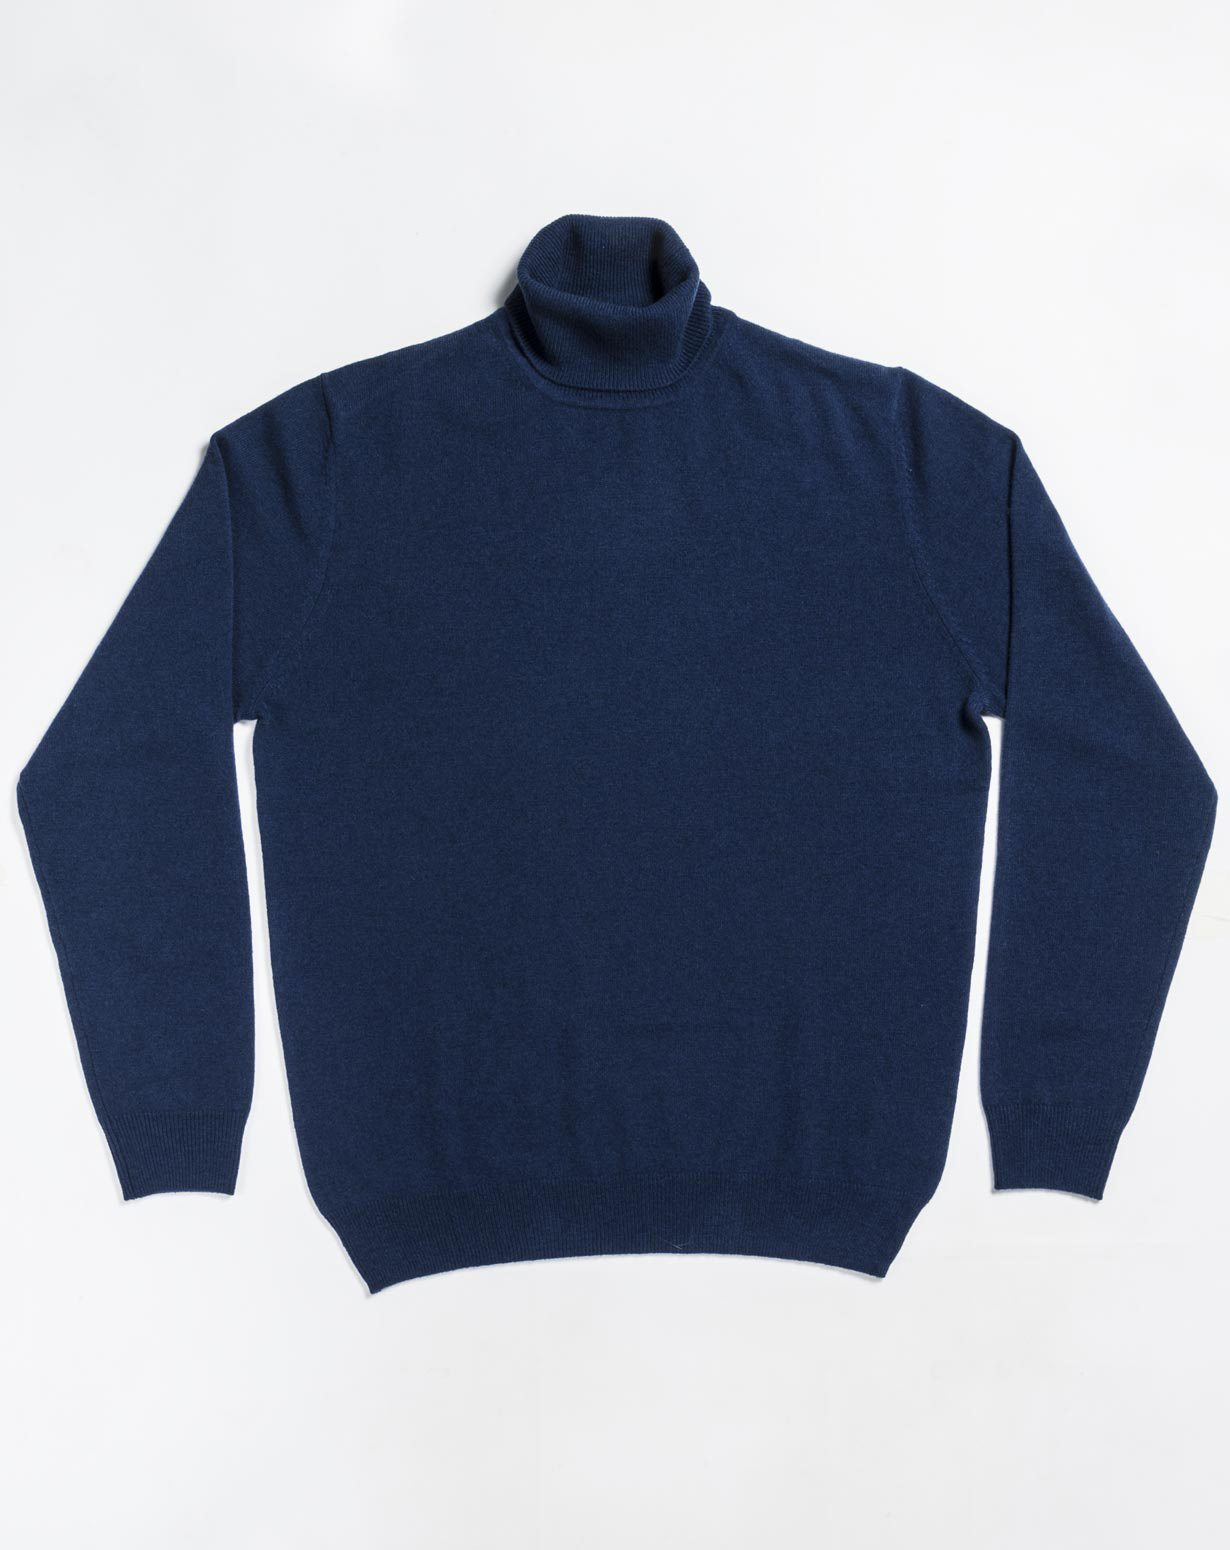 Men\u0027s Custom Knits , Cashmere Turtleneck